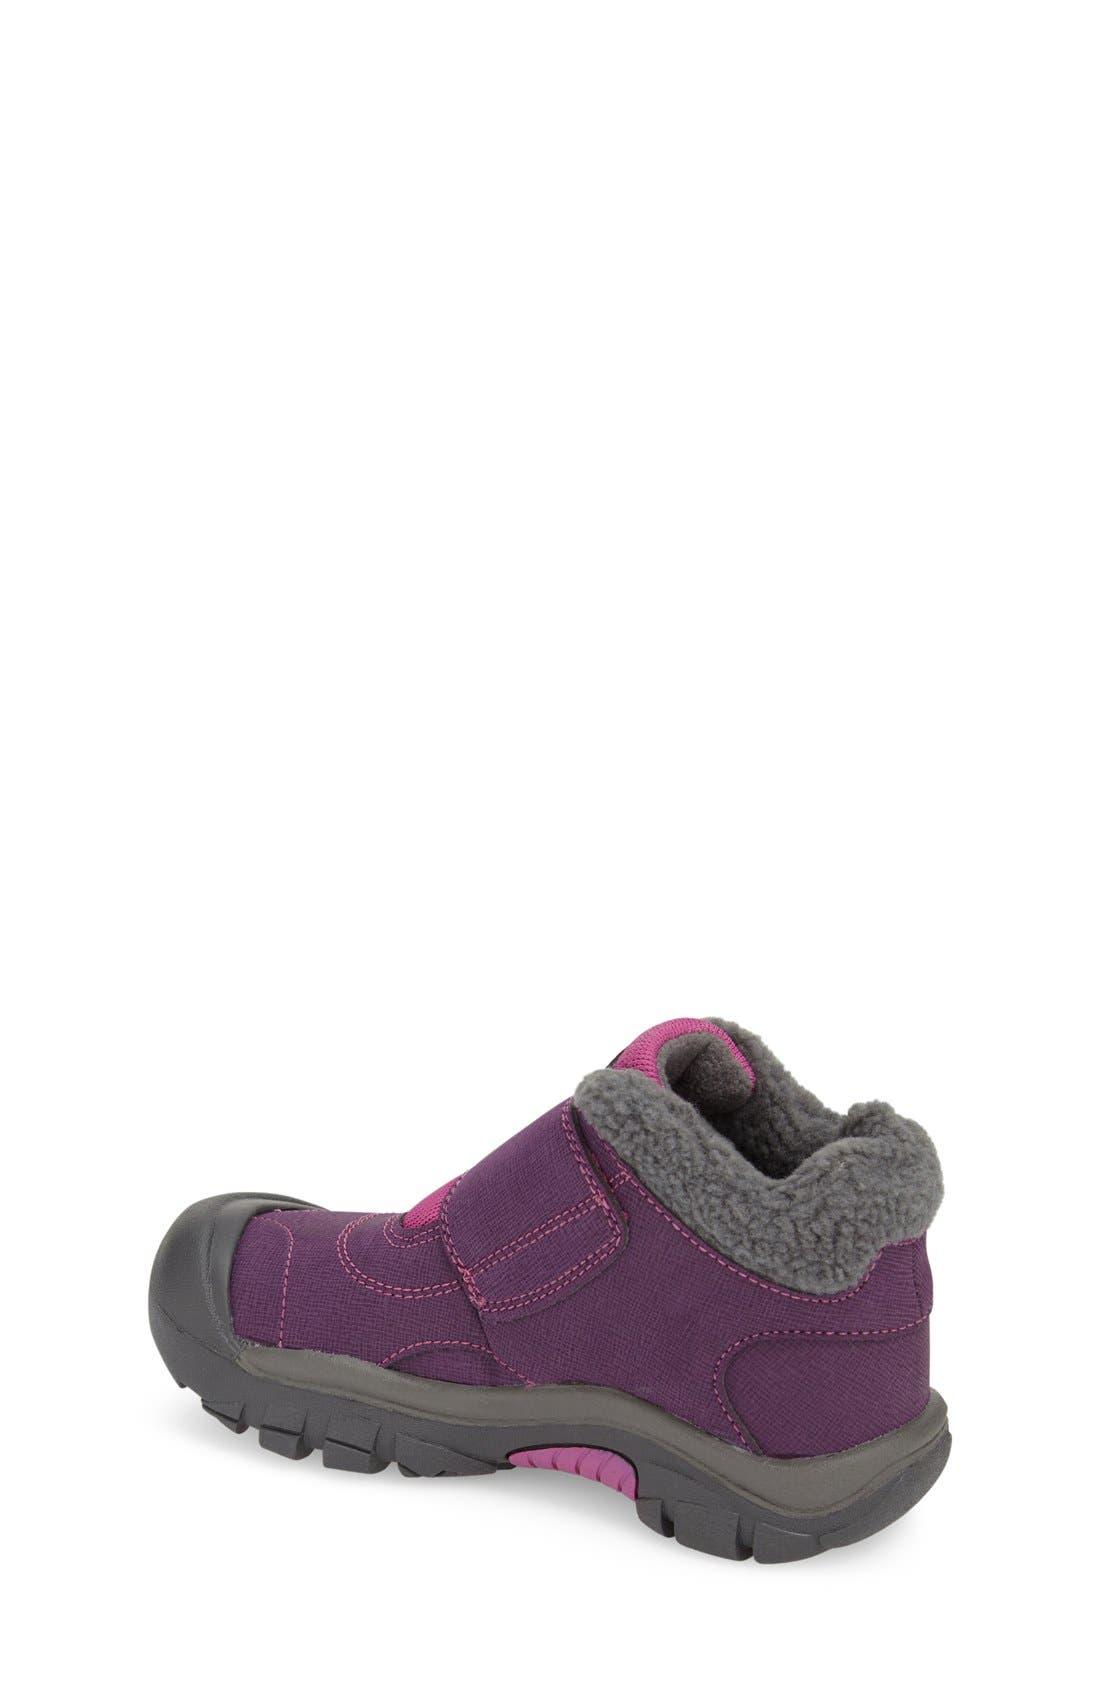 'Kootenay' Waterproof Winter Boot,                             Alternate thumbnail 2, color,                             Wineberry/ Dahlia Mauve